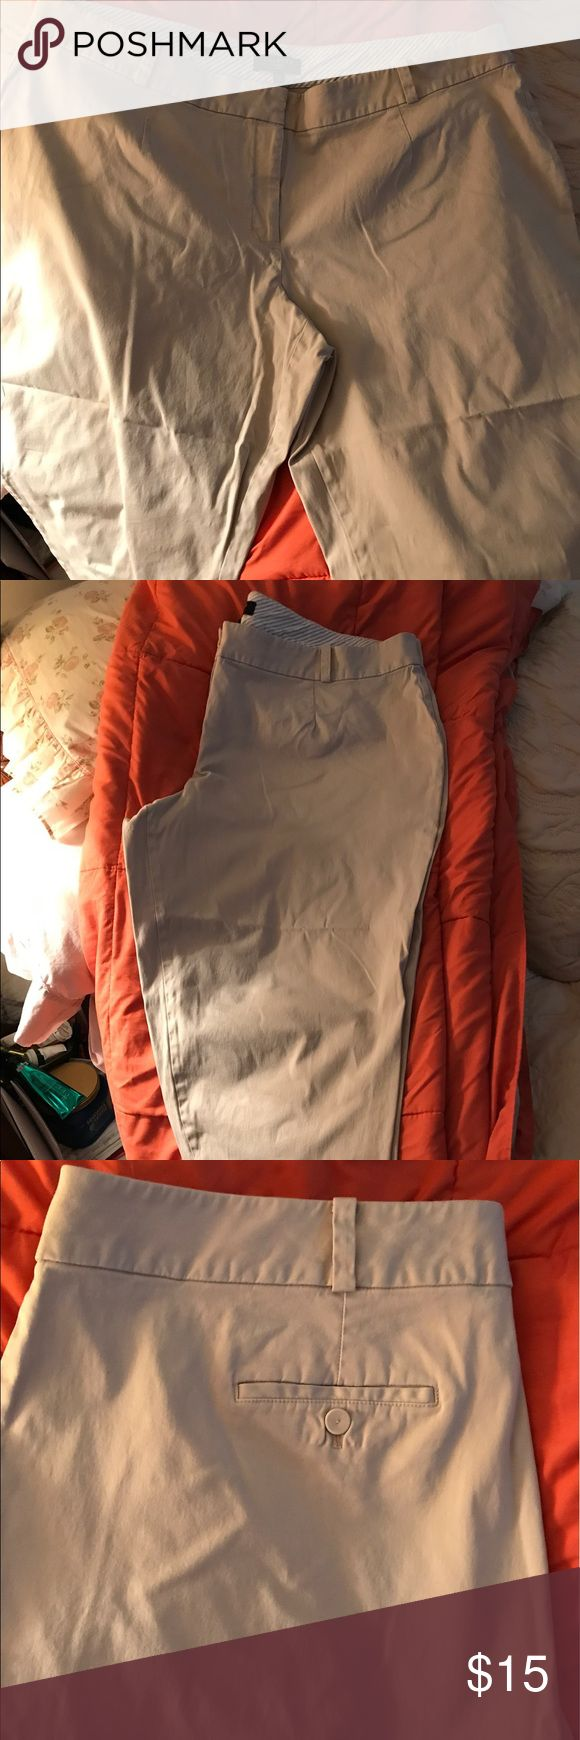 Khaki colored Size 22W Talbots Capris. Khaki colored Talbots Capris Size 22W Excellent Condition! 💕💕🦋💕💕 Talbots Pants Capris